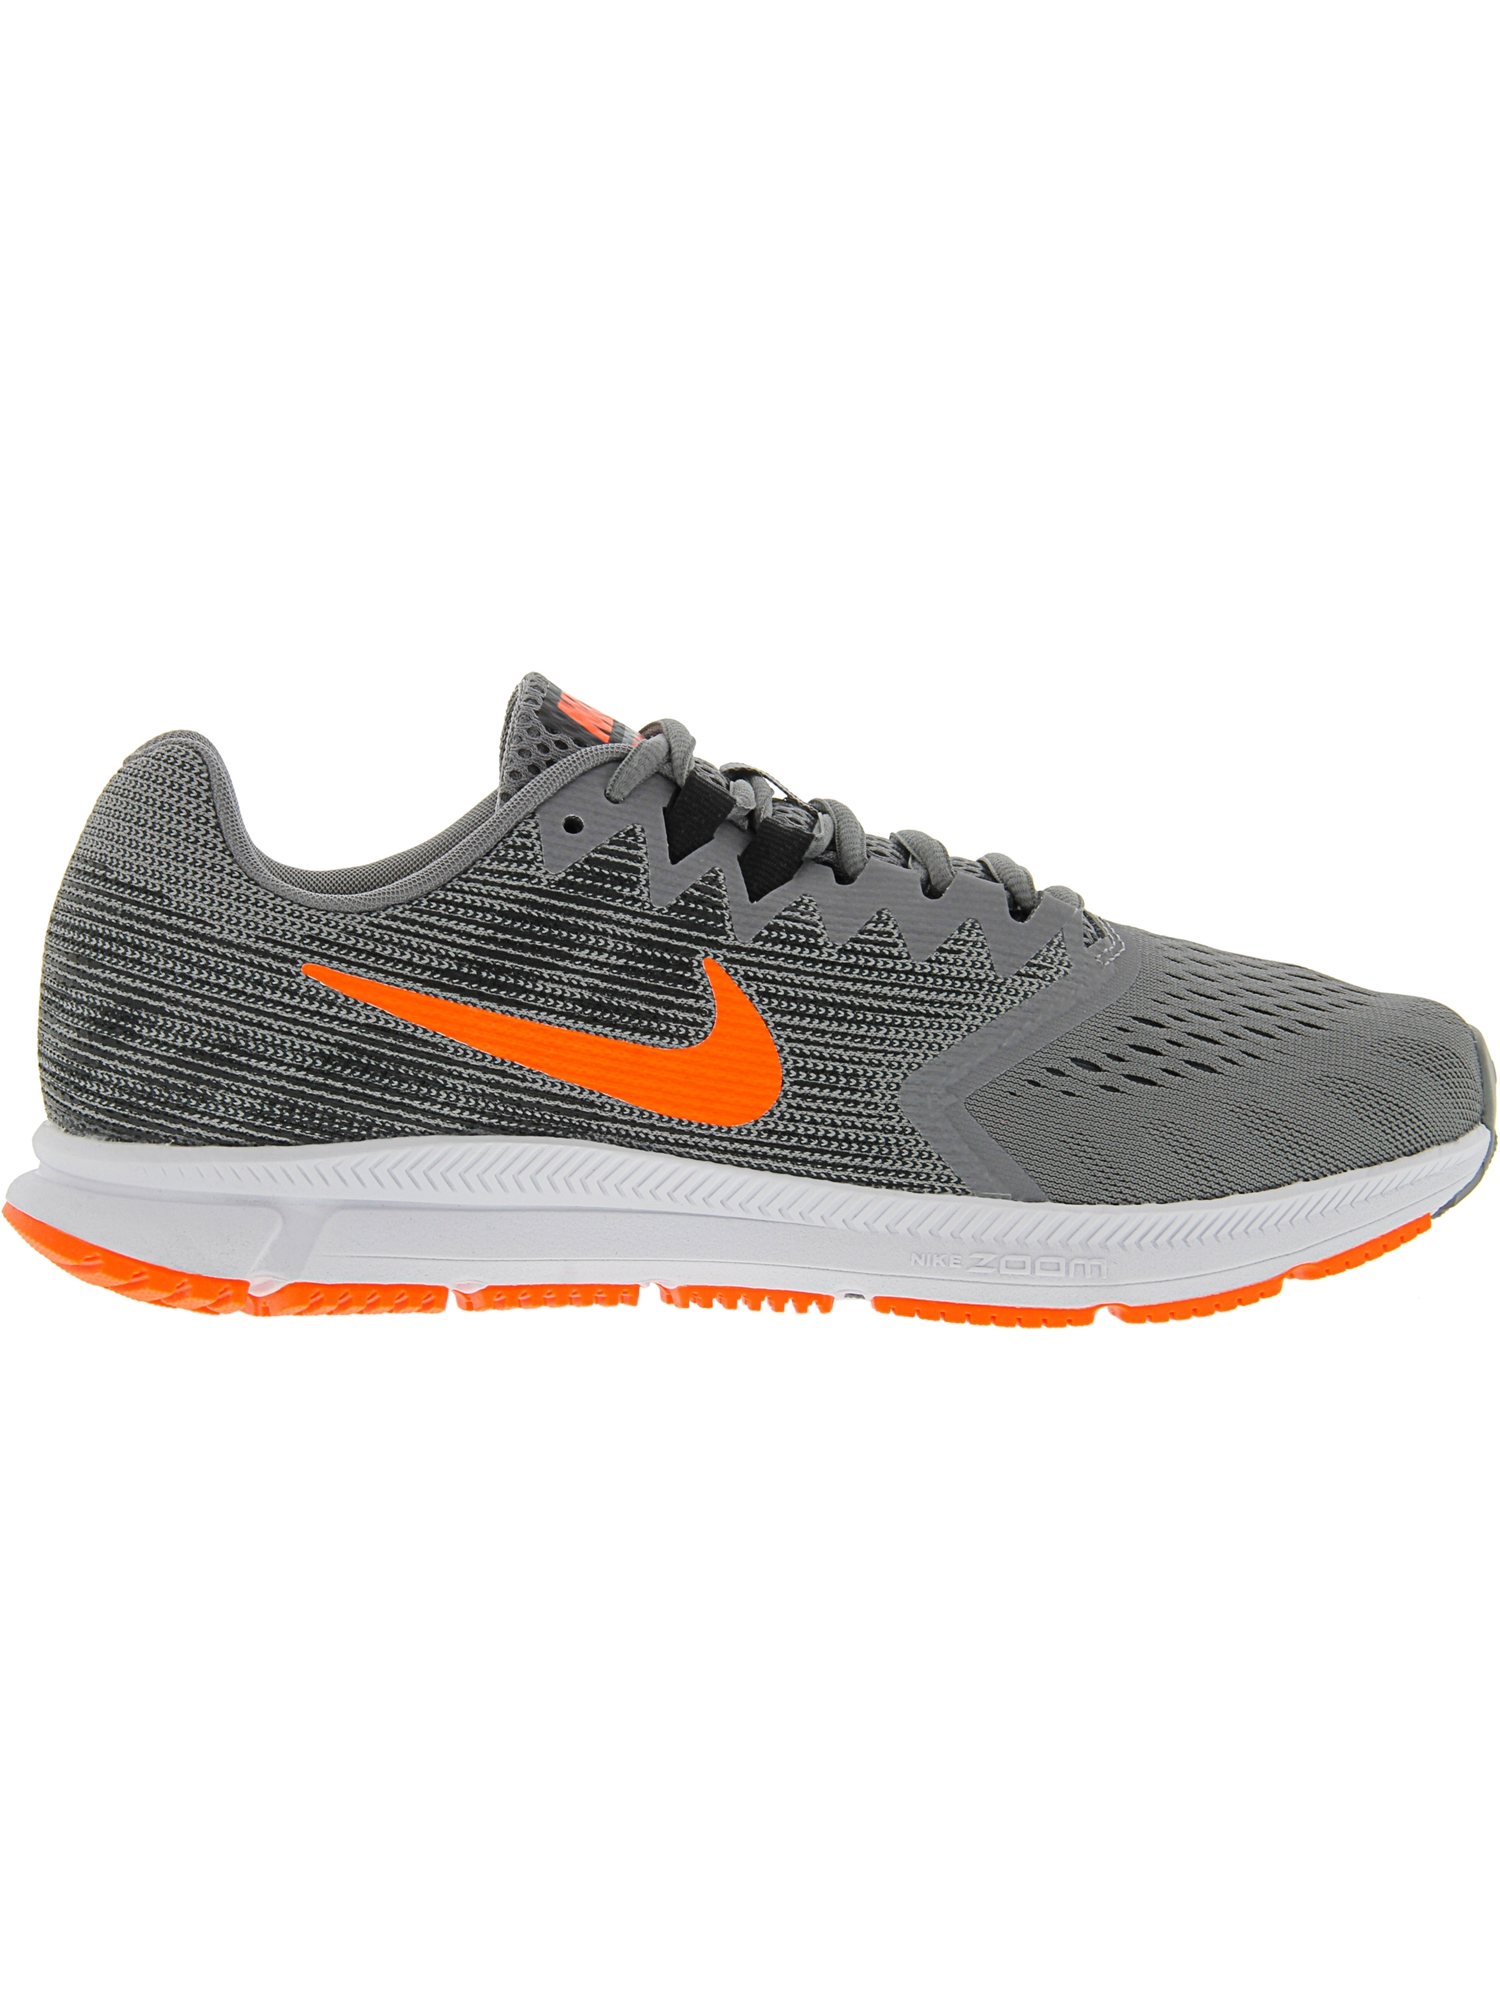 8ecf330d956f Nike - Nike Men s Zoom Span 2 Gunsmoke   Total Crimson - Black Ankle-High  Running Shoe 8M - Walmart.com